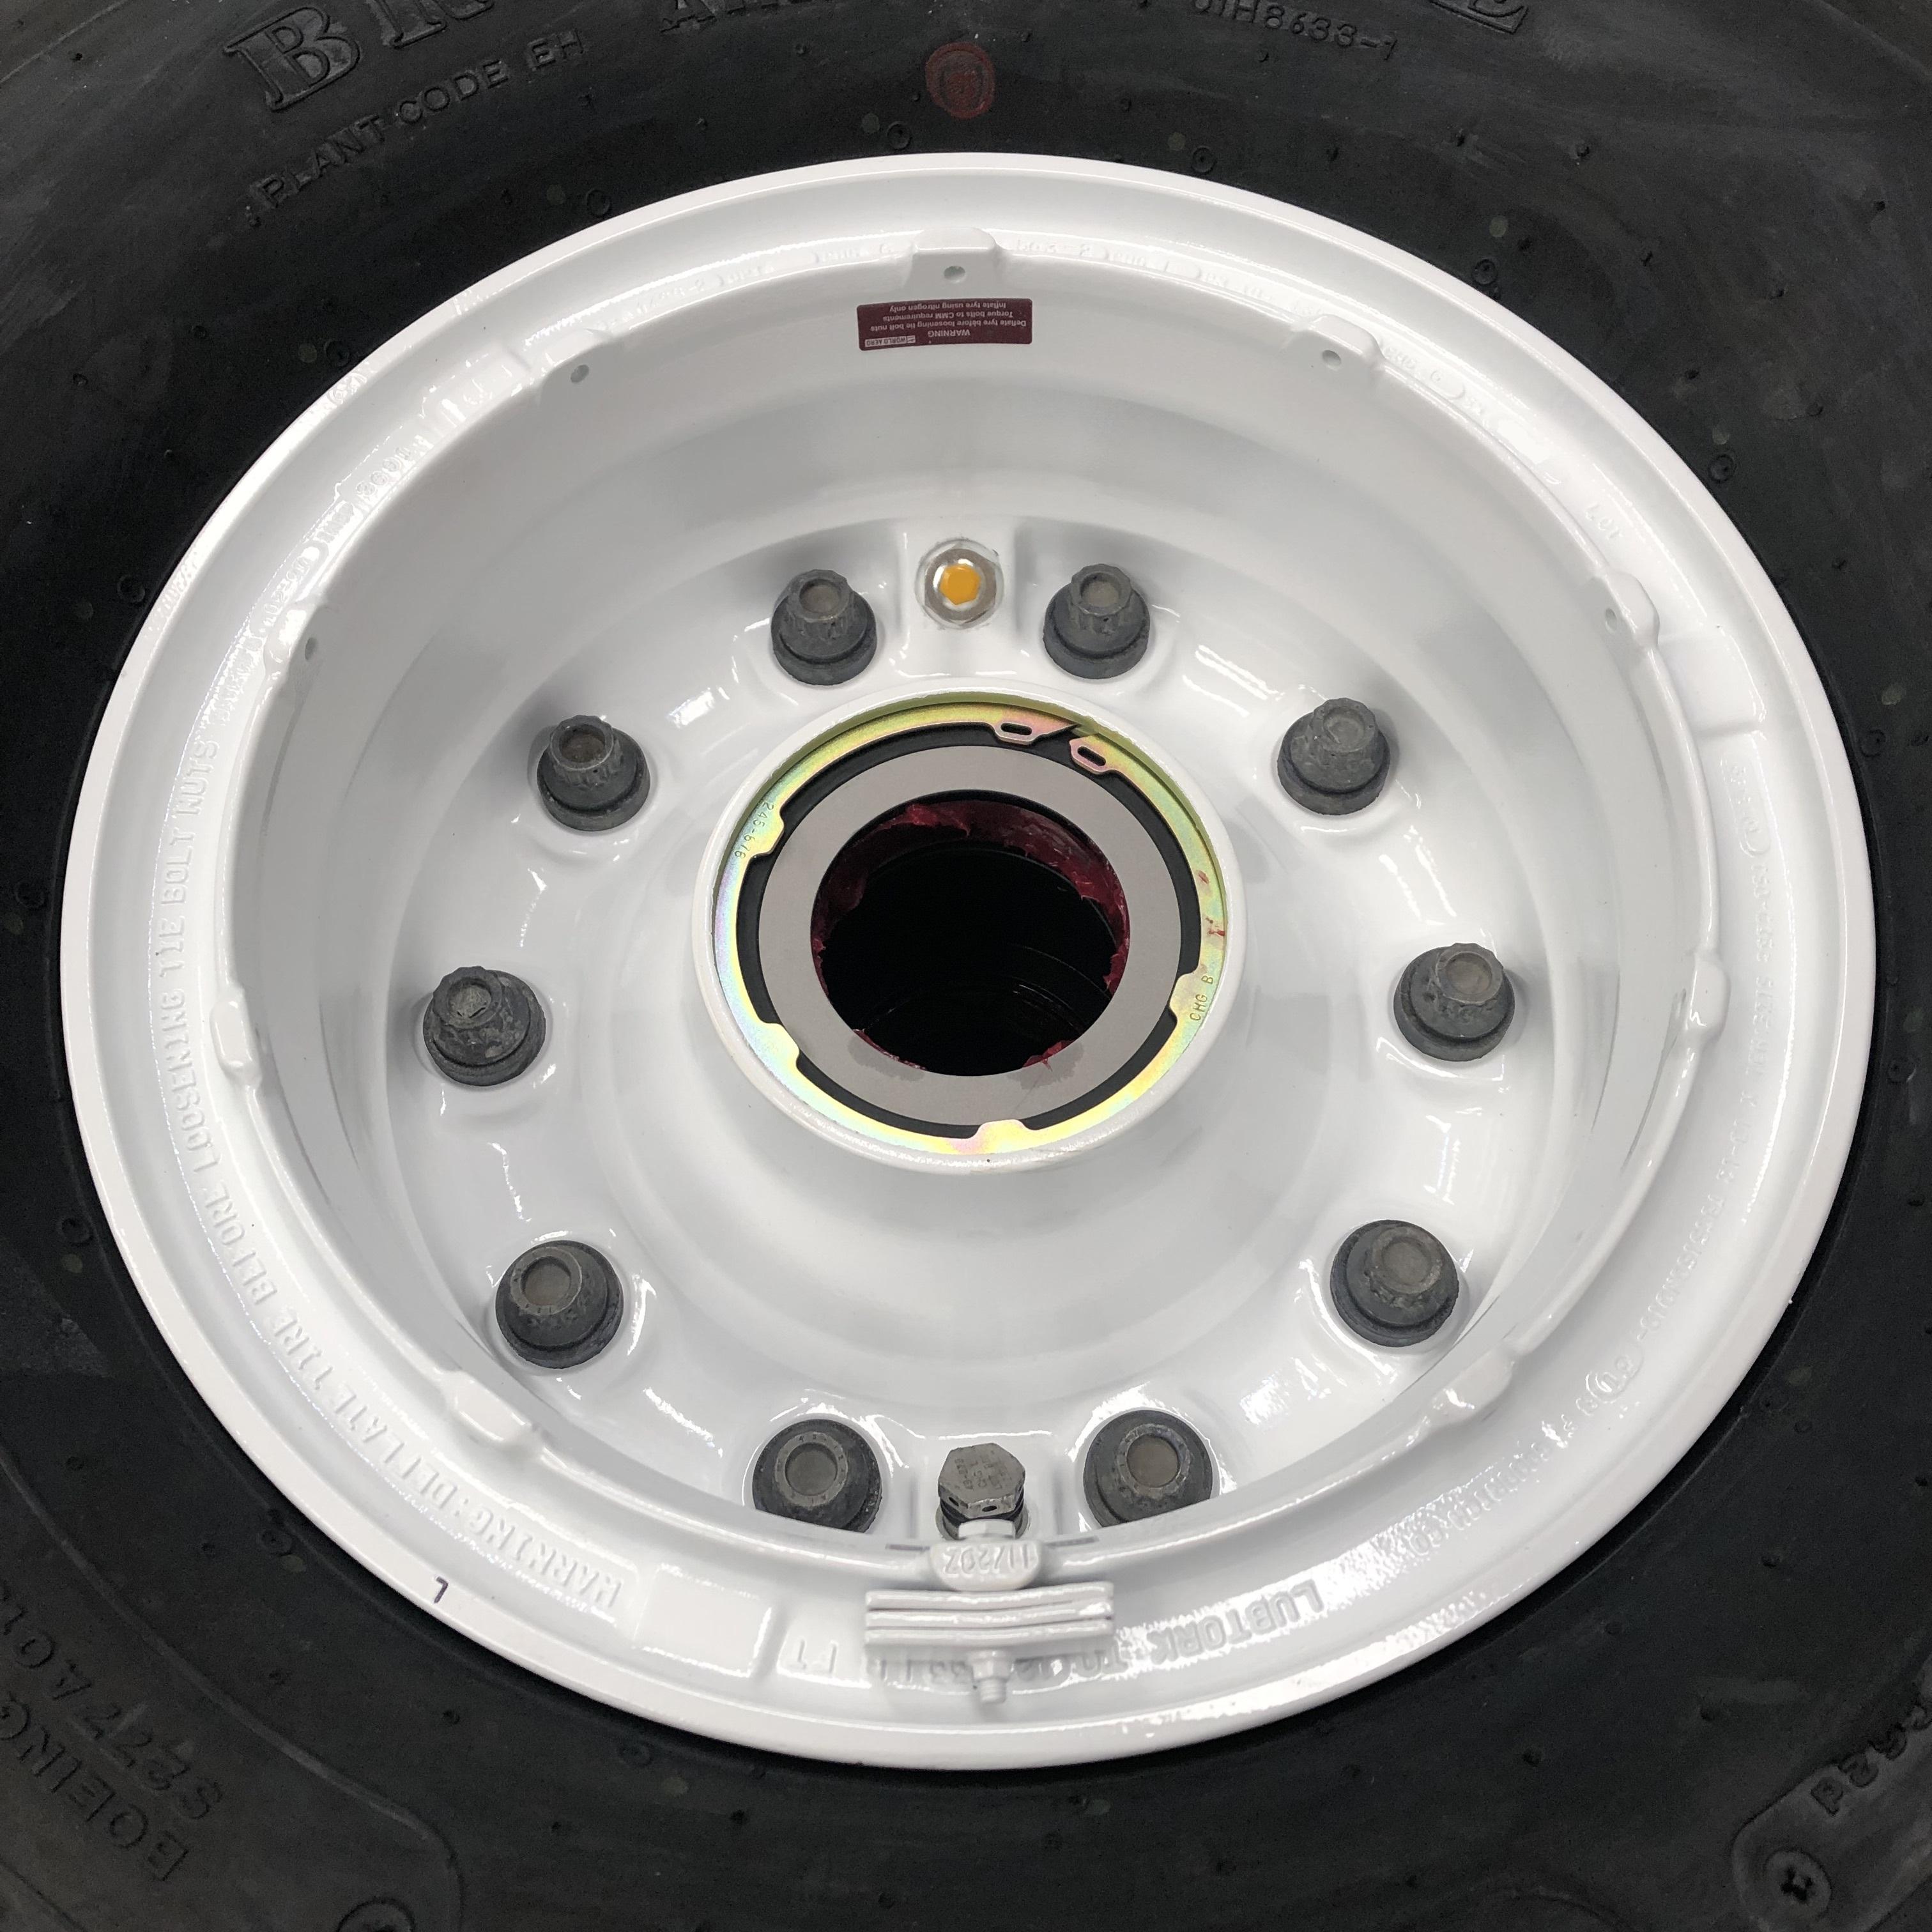 3-1423-2 Boeing 757 nose wheel